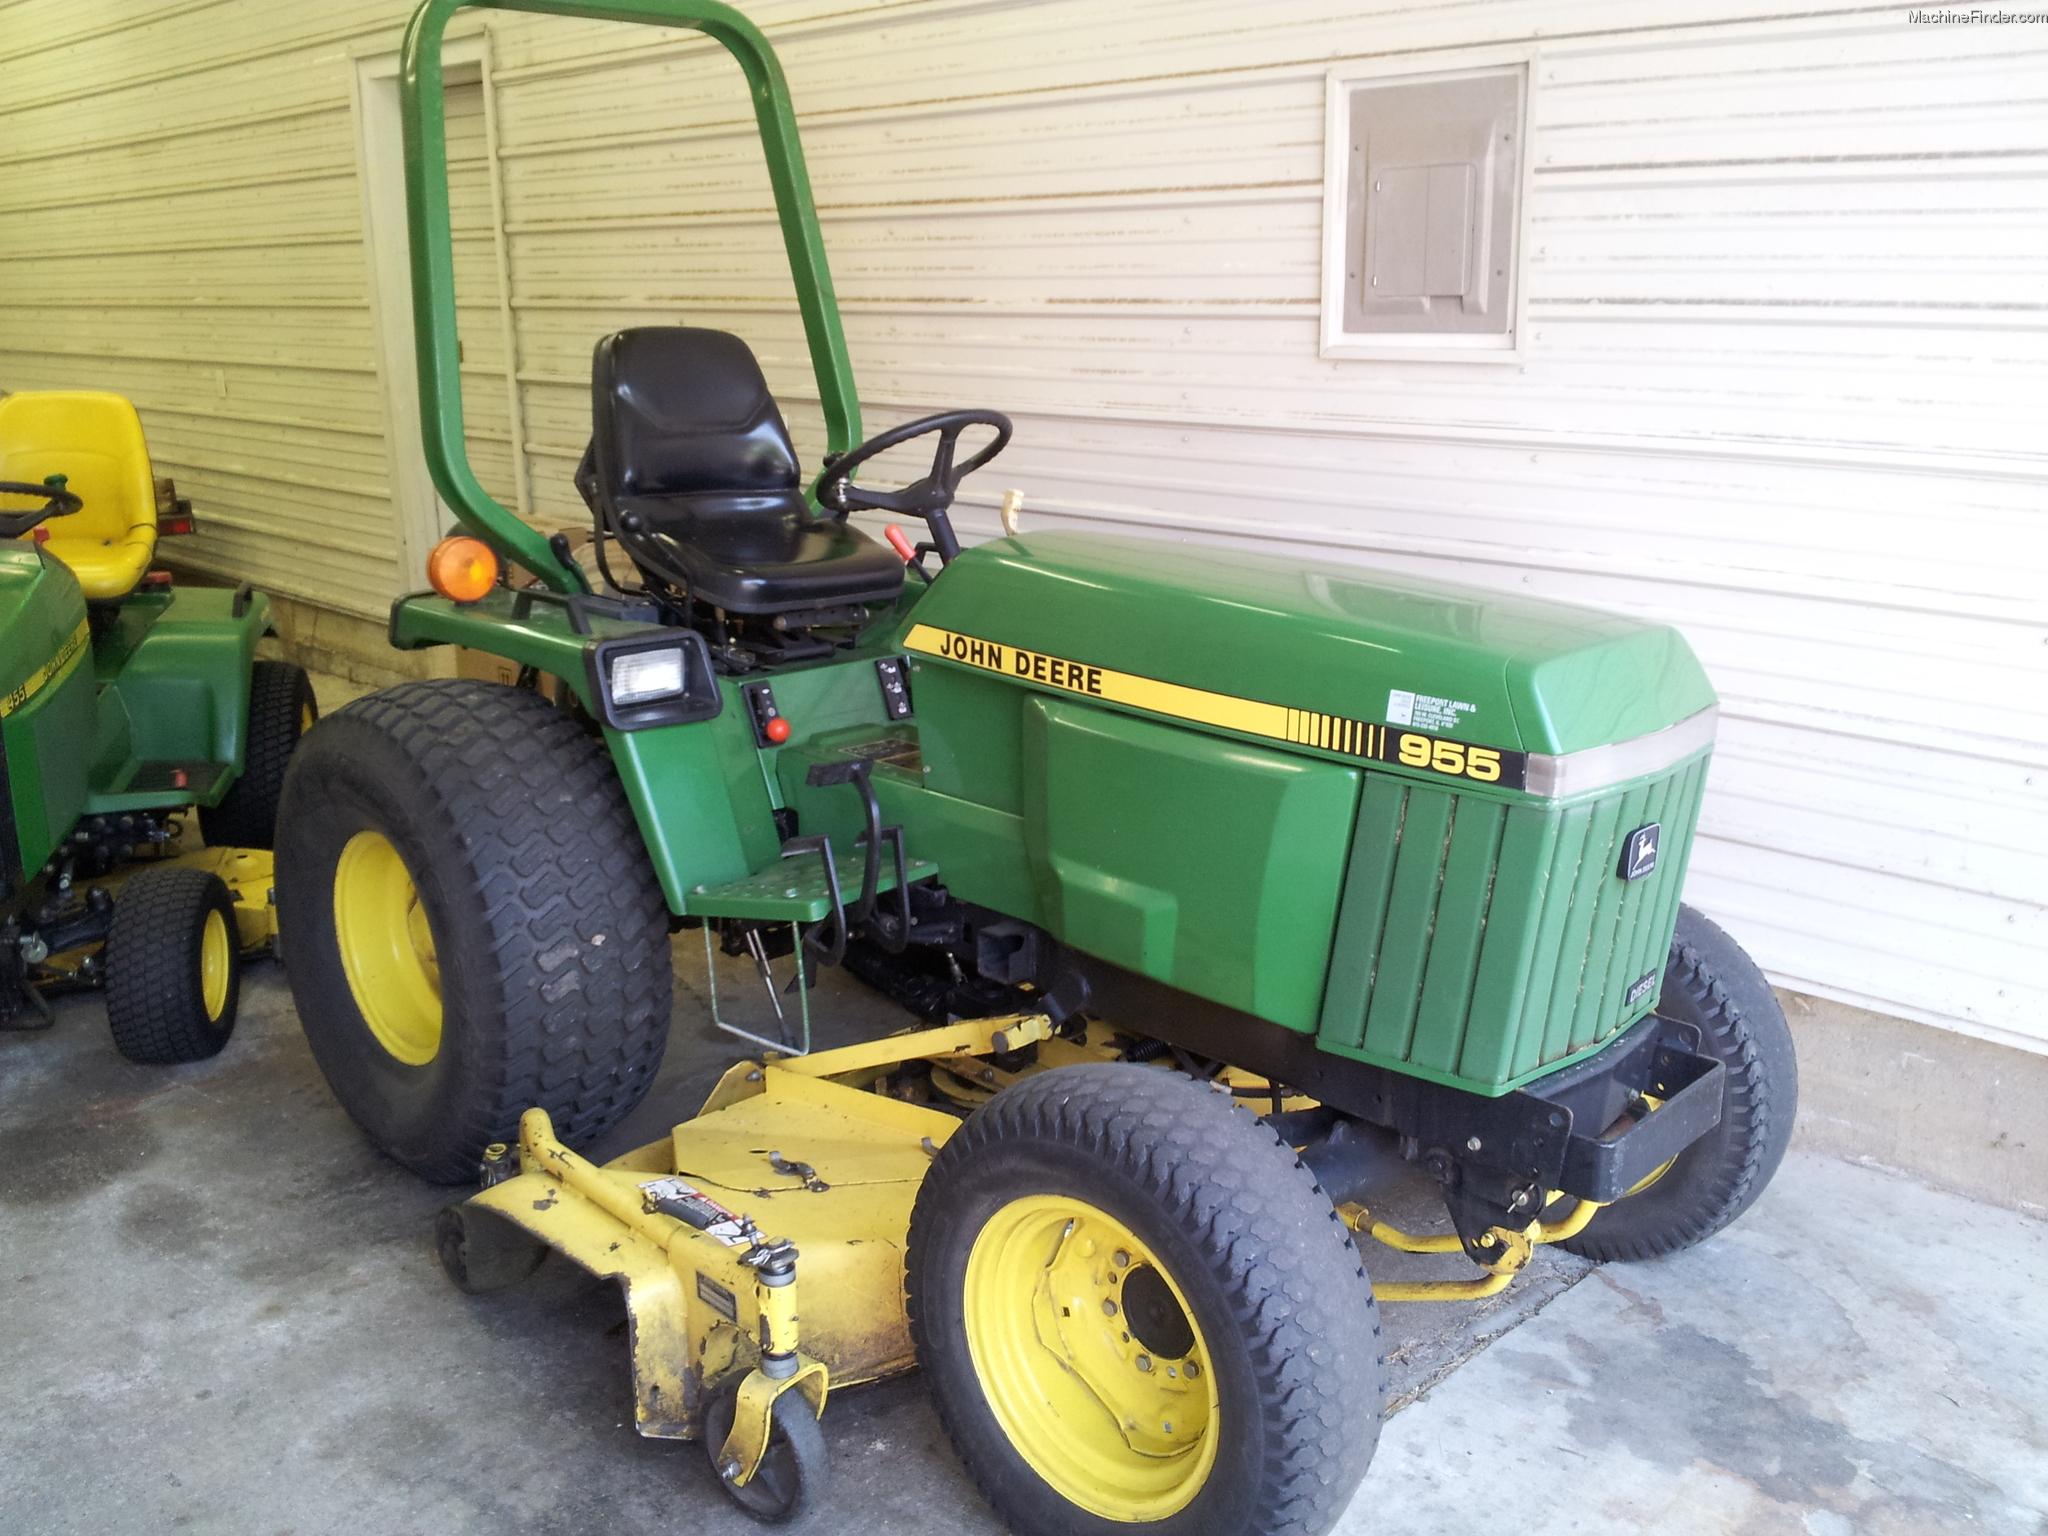 1997 John Deere 955 Tractors - Compact (1-40hp.) - John ...